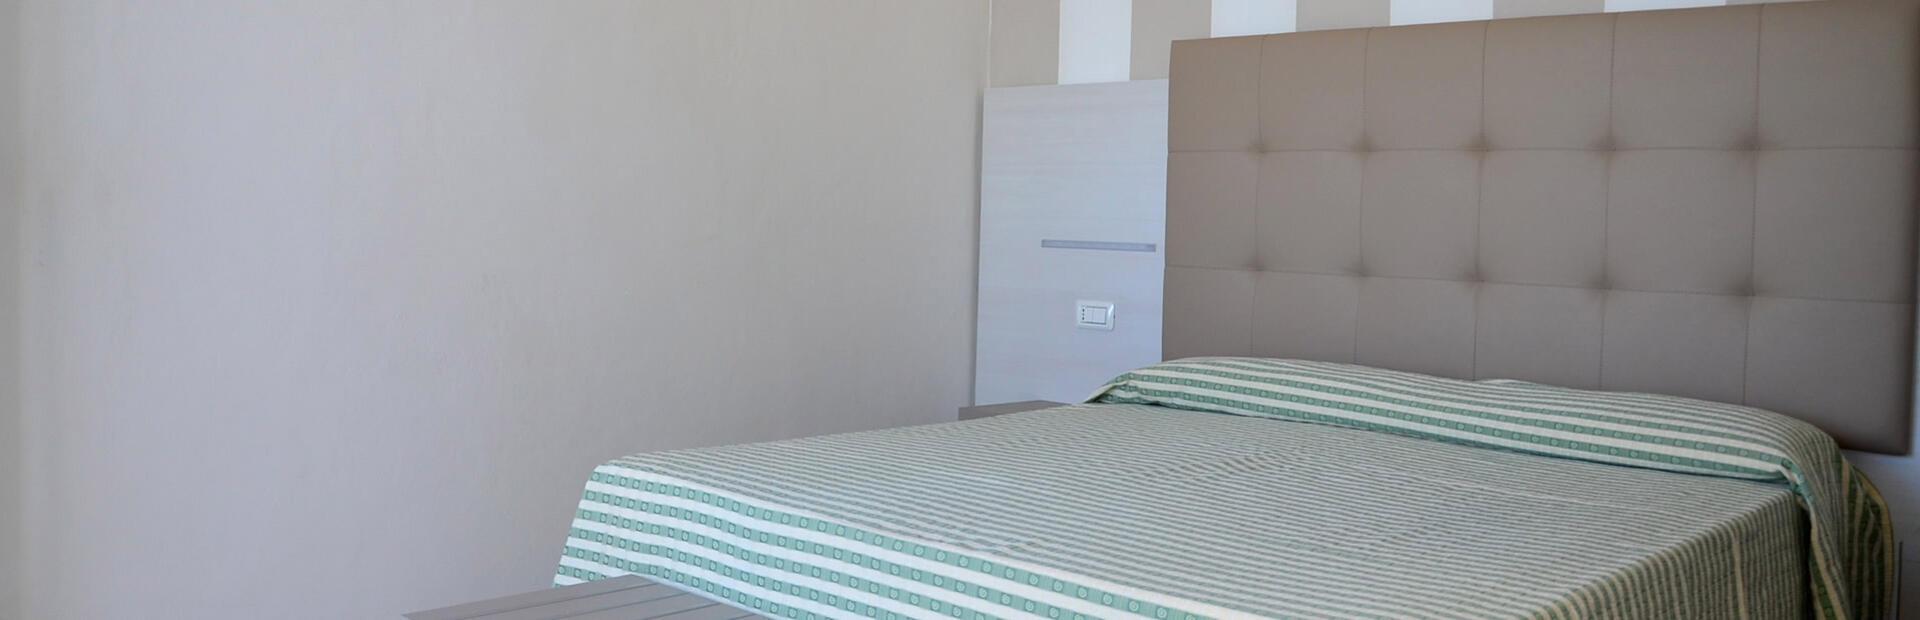 hotelgardencesenatico fr chambre-superior-cesenatico 004